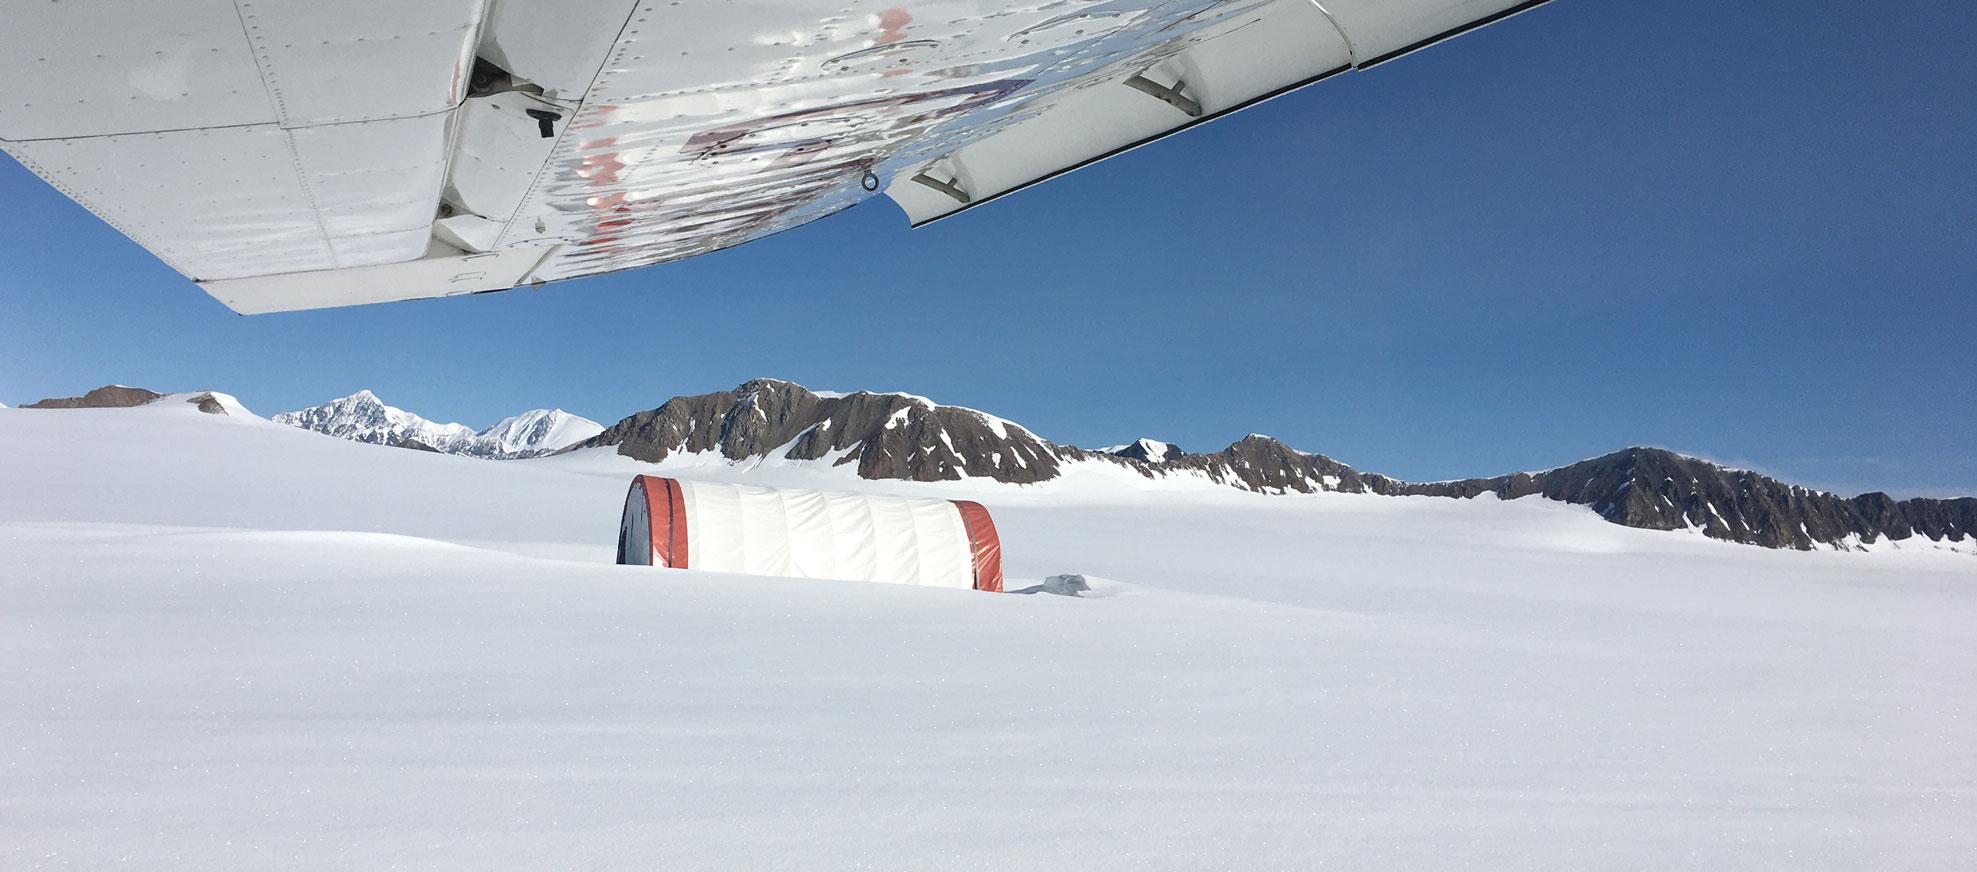 C:\Users\Russ\Desktop\2020Aug, Yukon\Glacier flight\IMG_2225-1.jpg